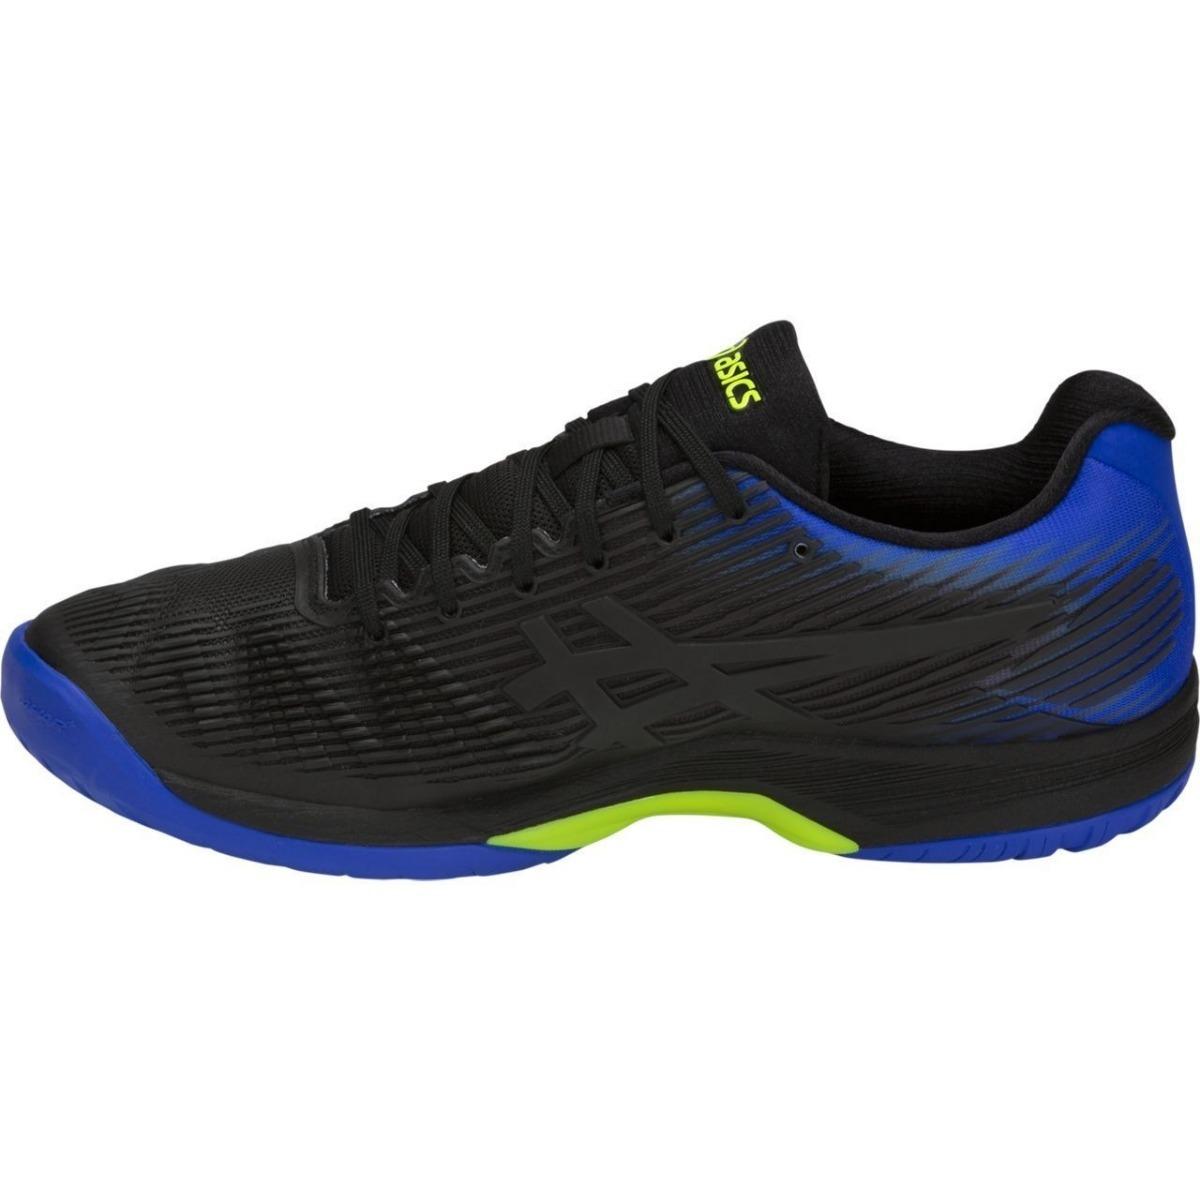 3eb7862f27 Tênis Asics Gel Solution Speed Ff Tennis